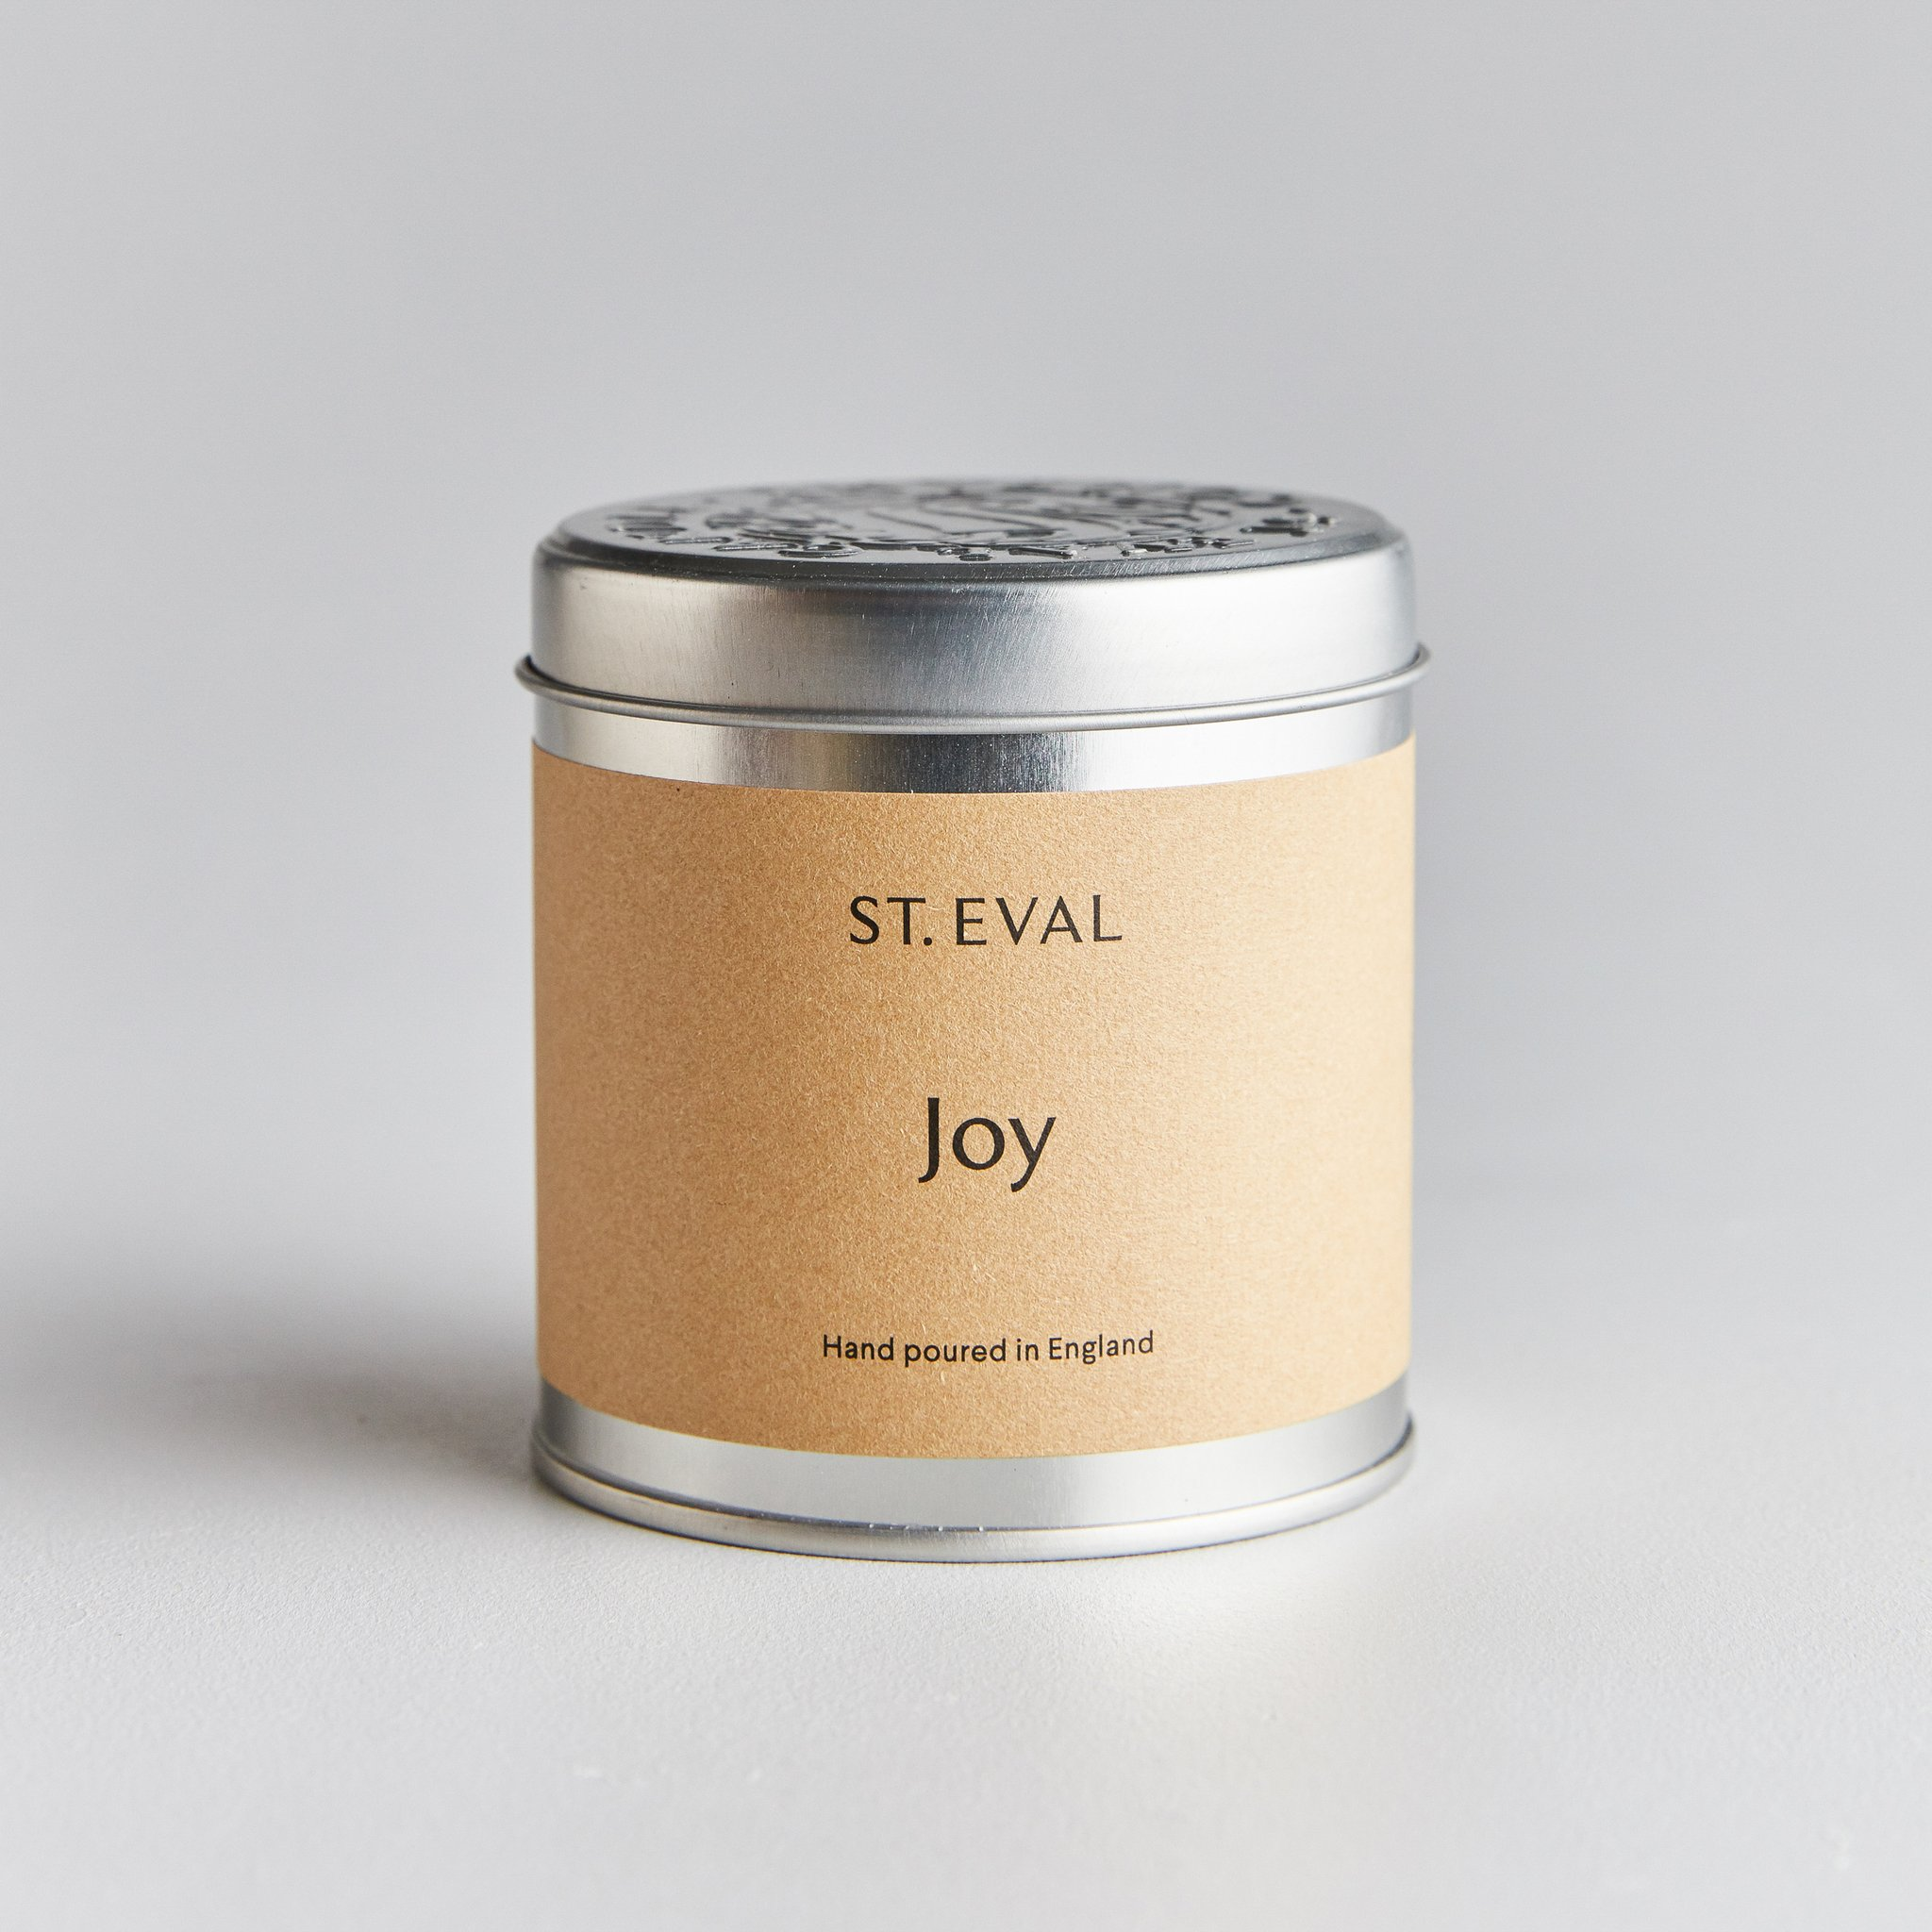 St Eval Candle Tin - Joy